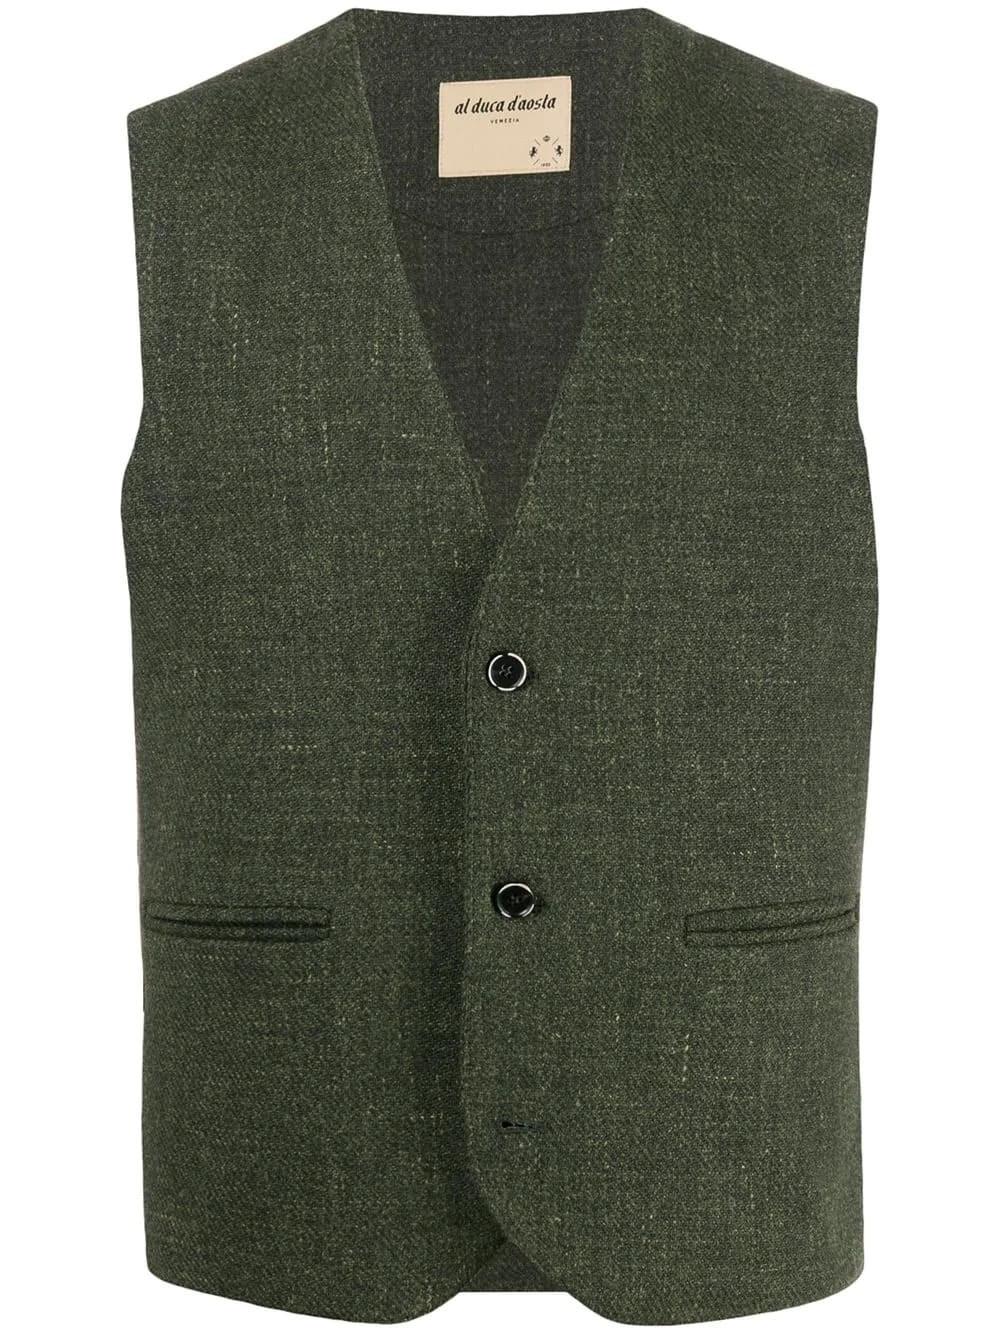 AL DUCA D'AOSTA 1902 Green Wool Tweed Gilet